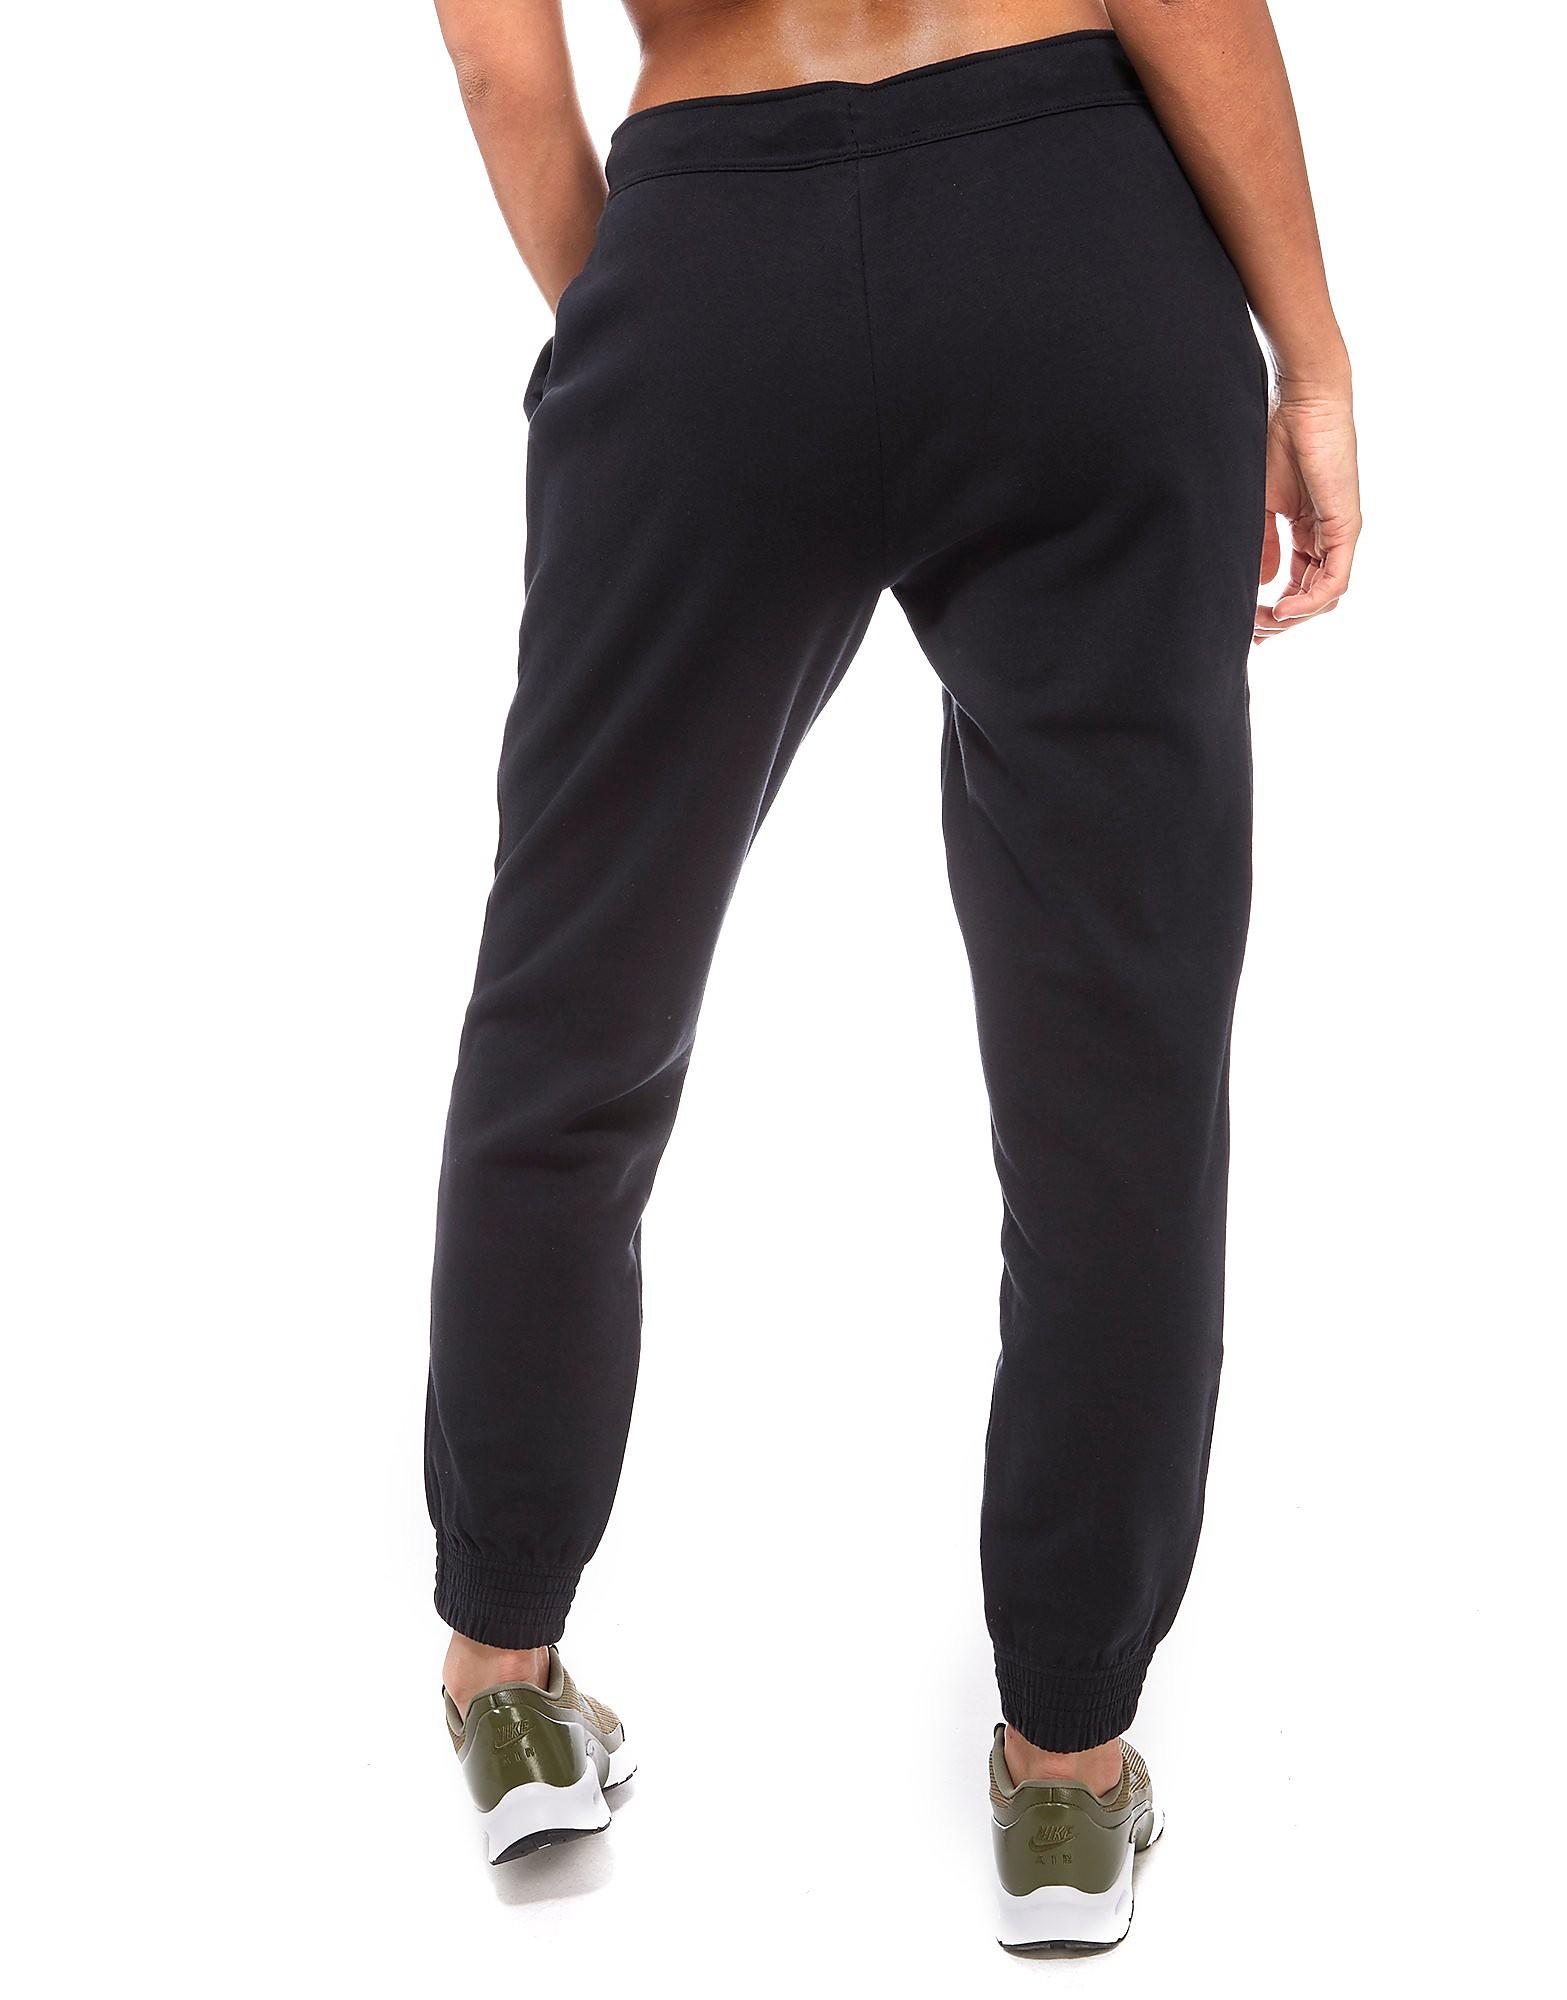 Nike Air Max Track Pants